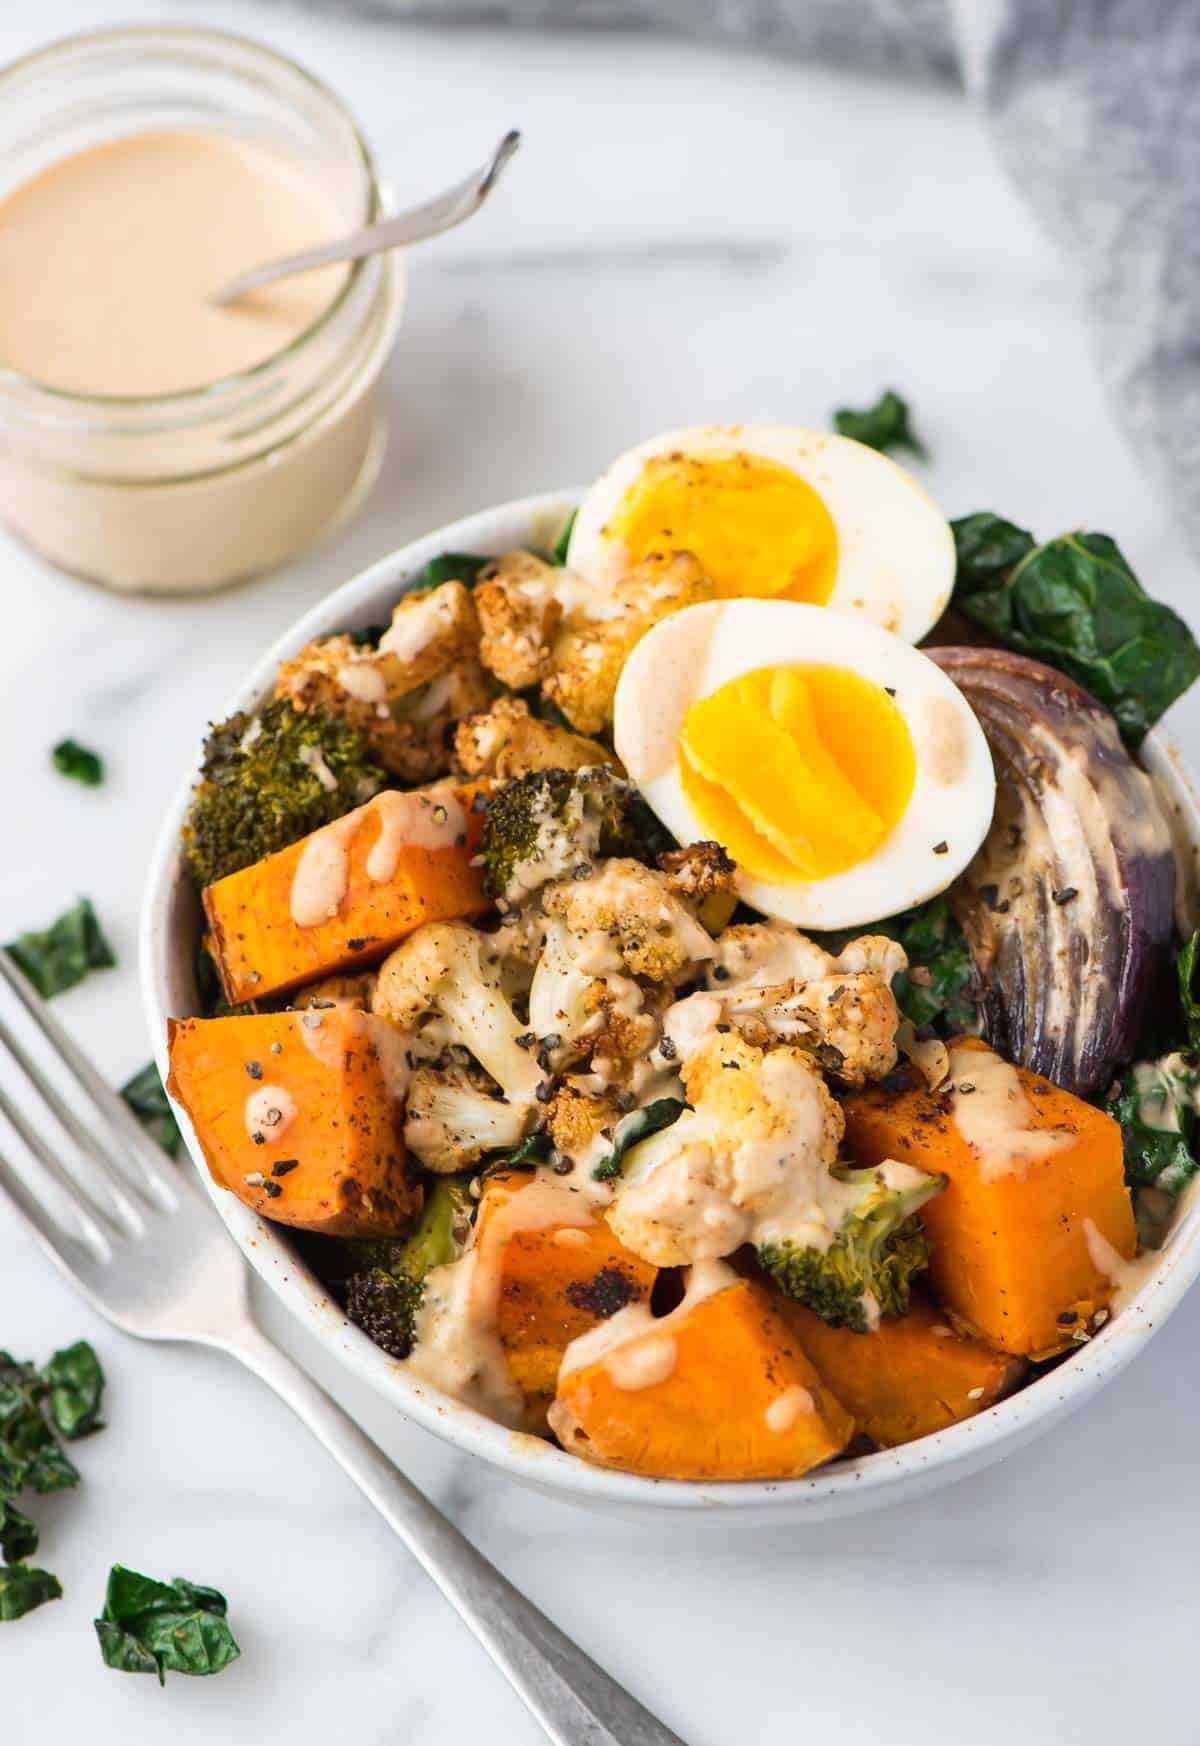 Alt Easy Whole30 Vegetarian Power Bowl This Tasty Bowl